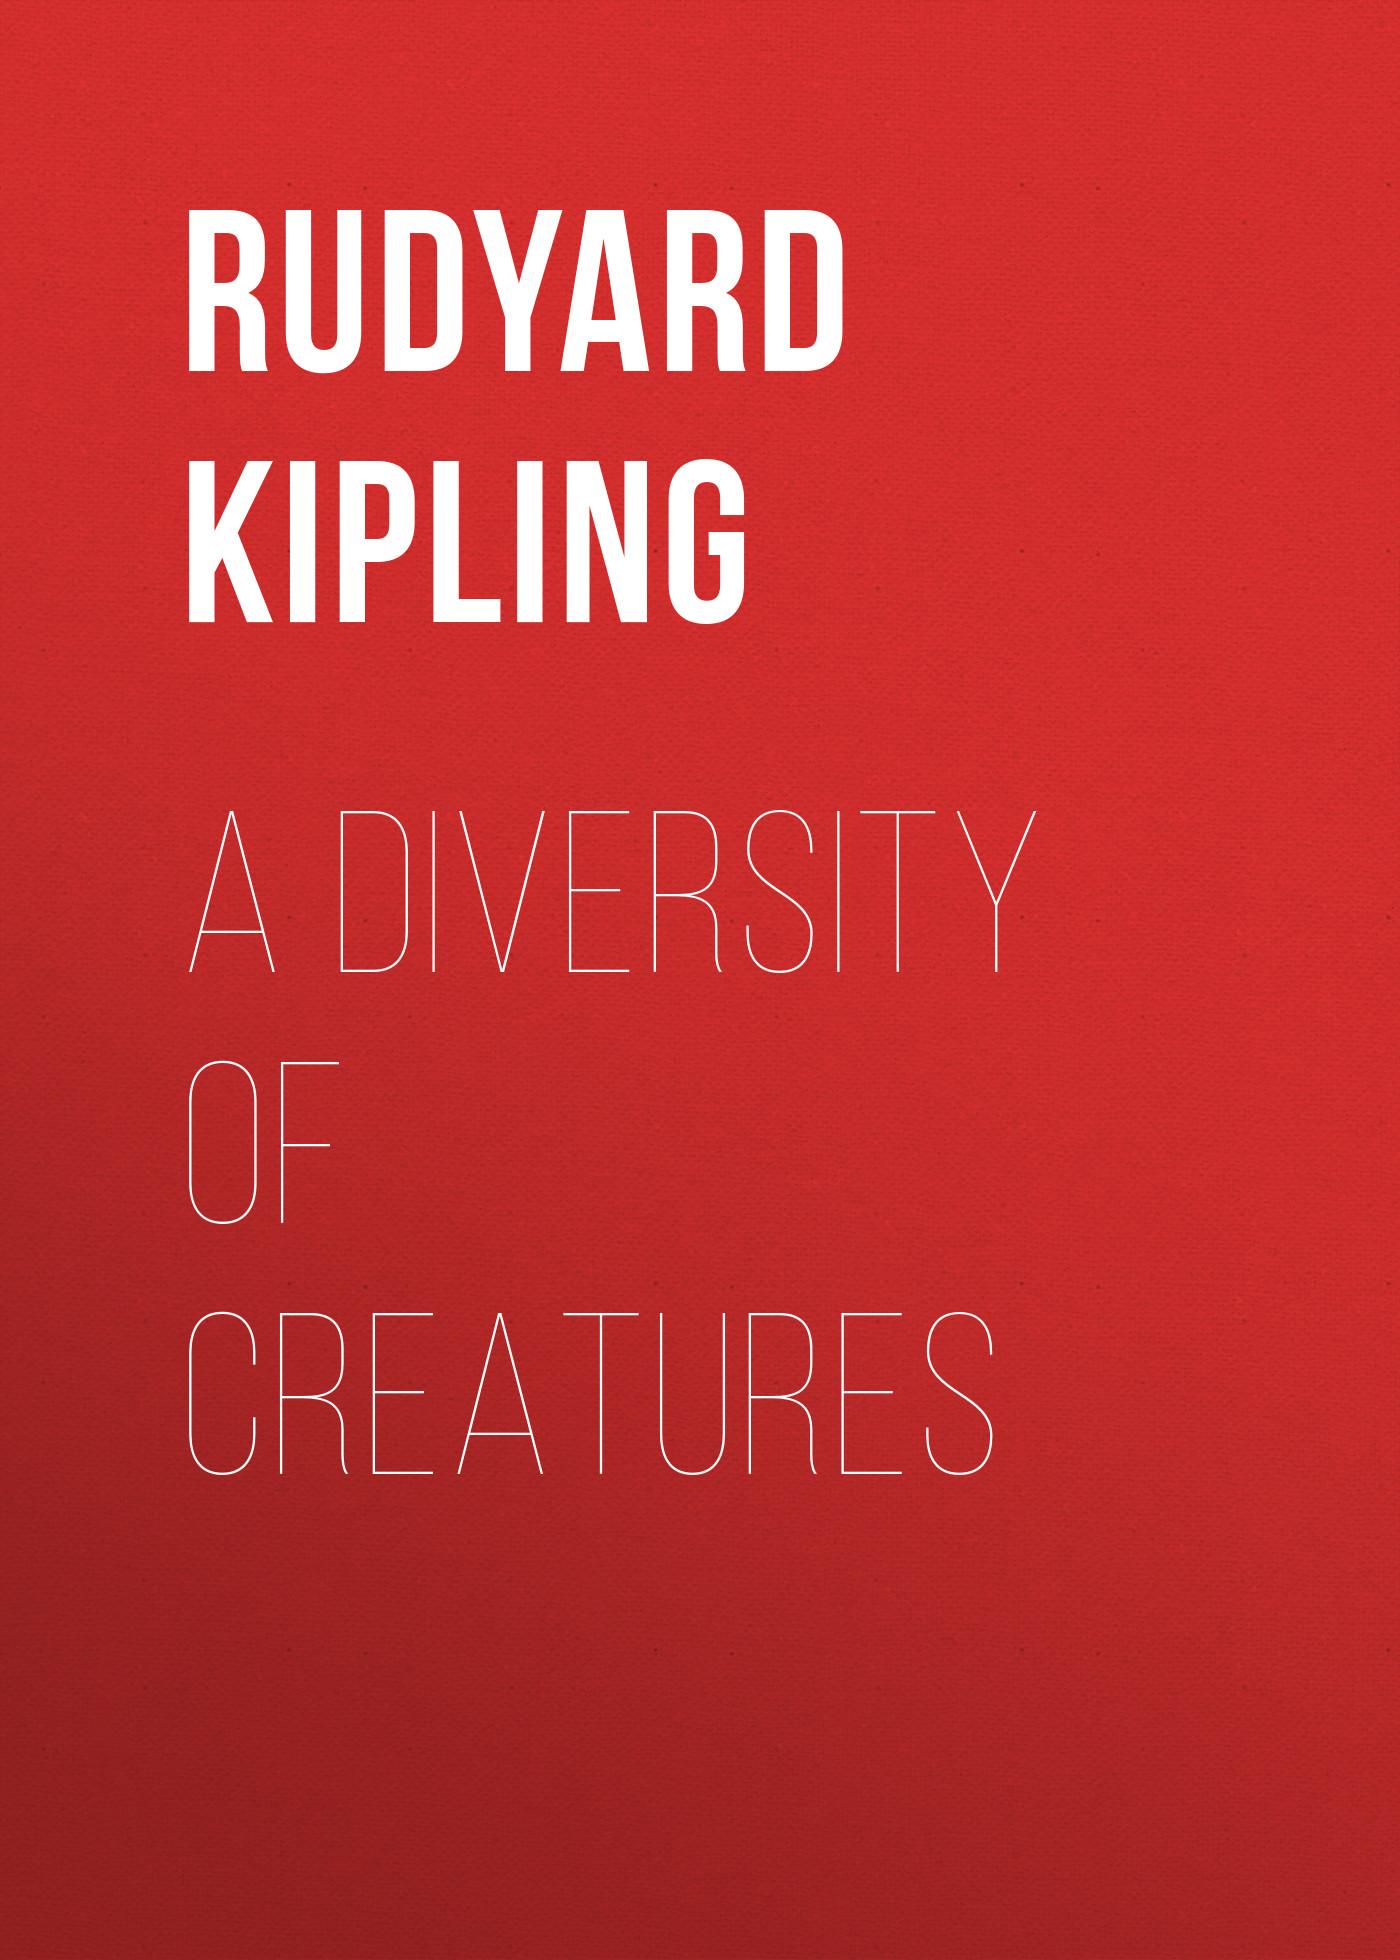 Редьярд Киплинг A Diversity of Creatures редьярд киплинг a diversity of creatures